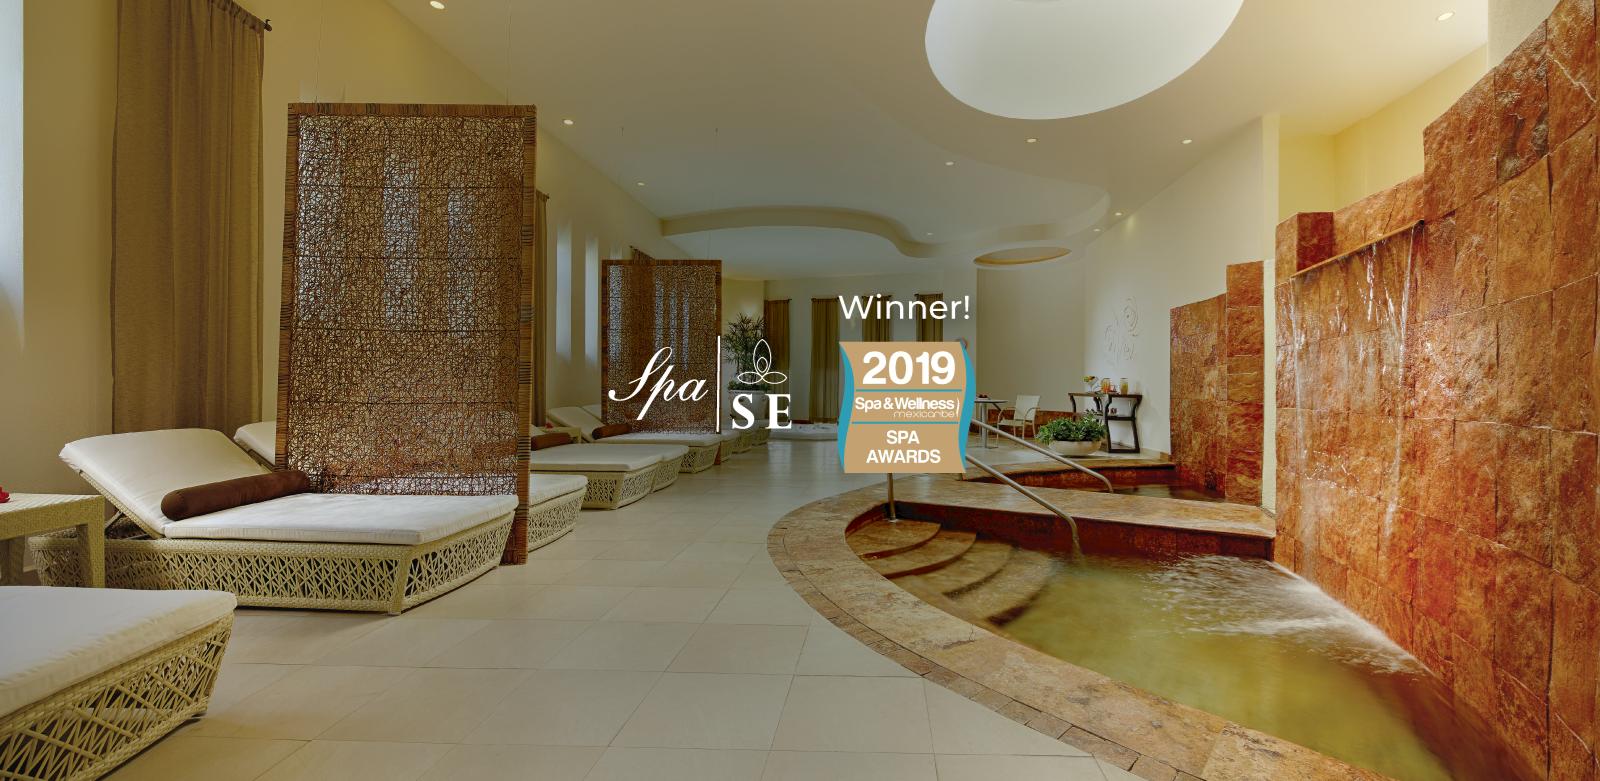 spa and wellness winner 2019